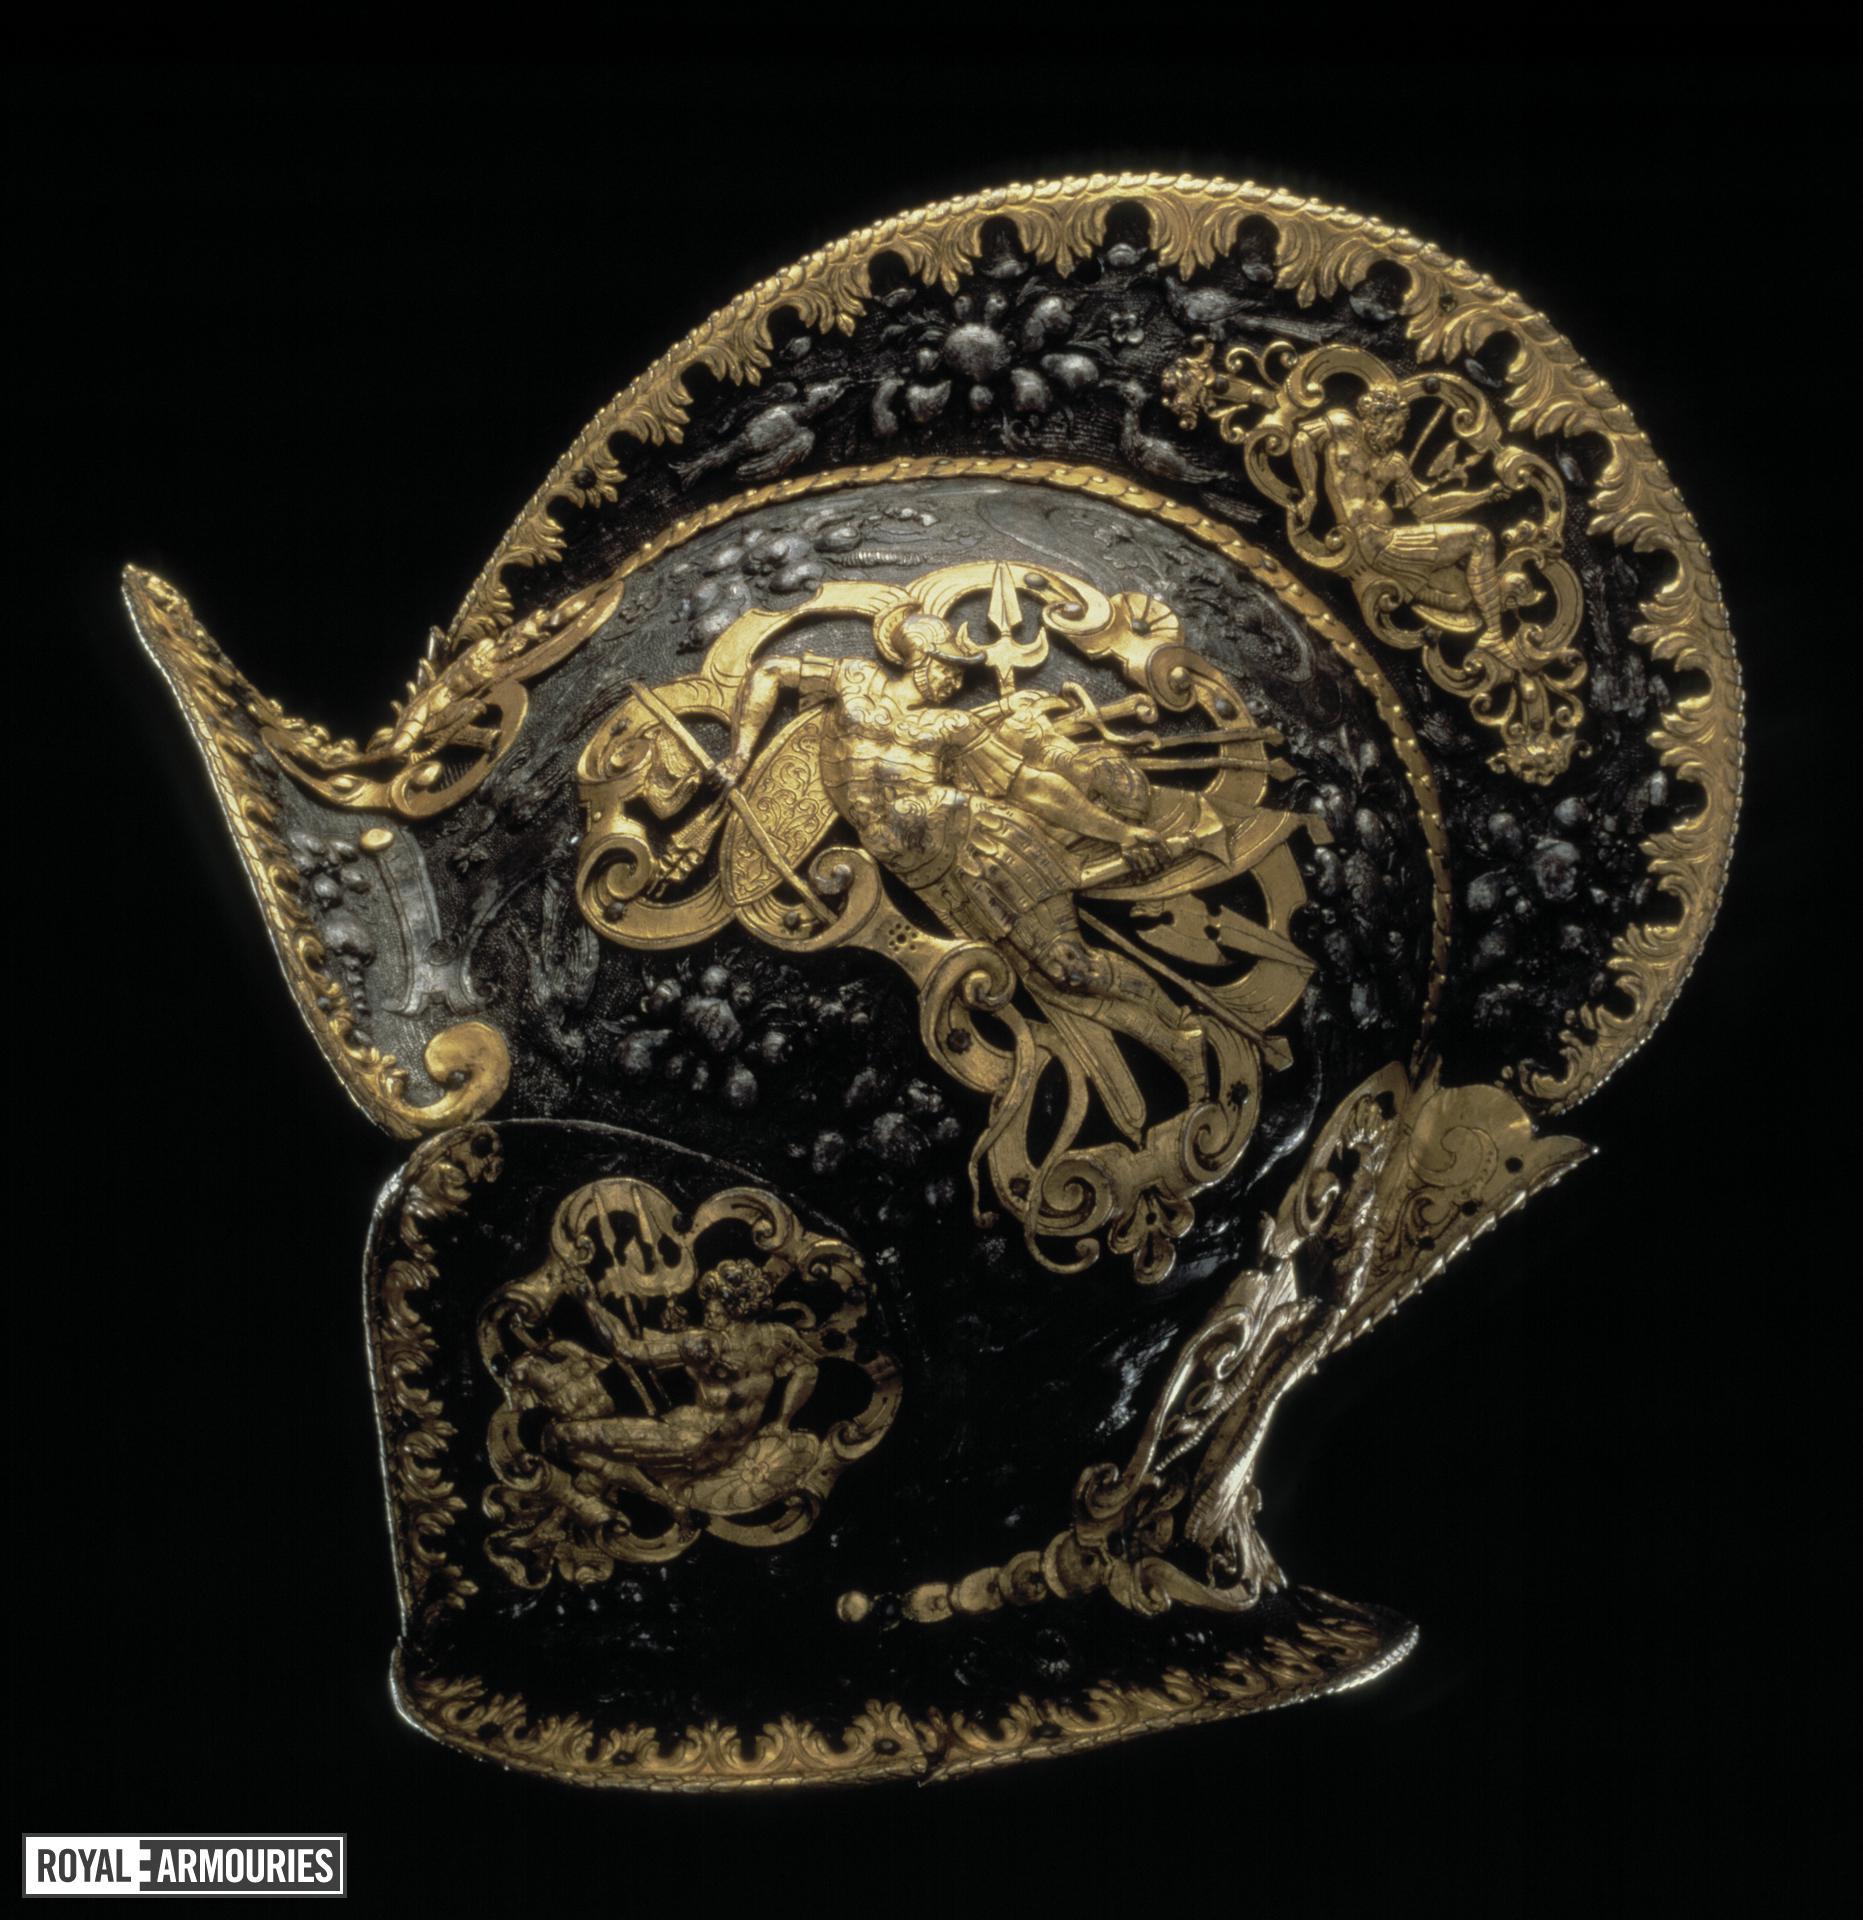 Burgonet. German, probably Augsburg, about 1600 IV.154